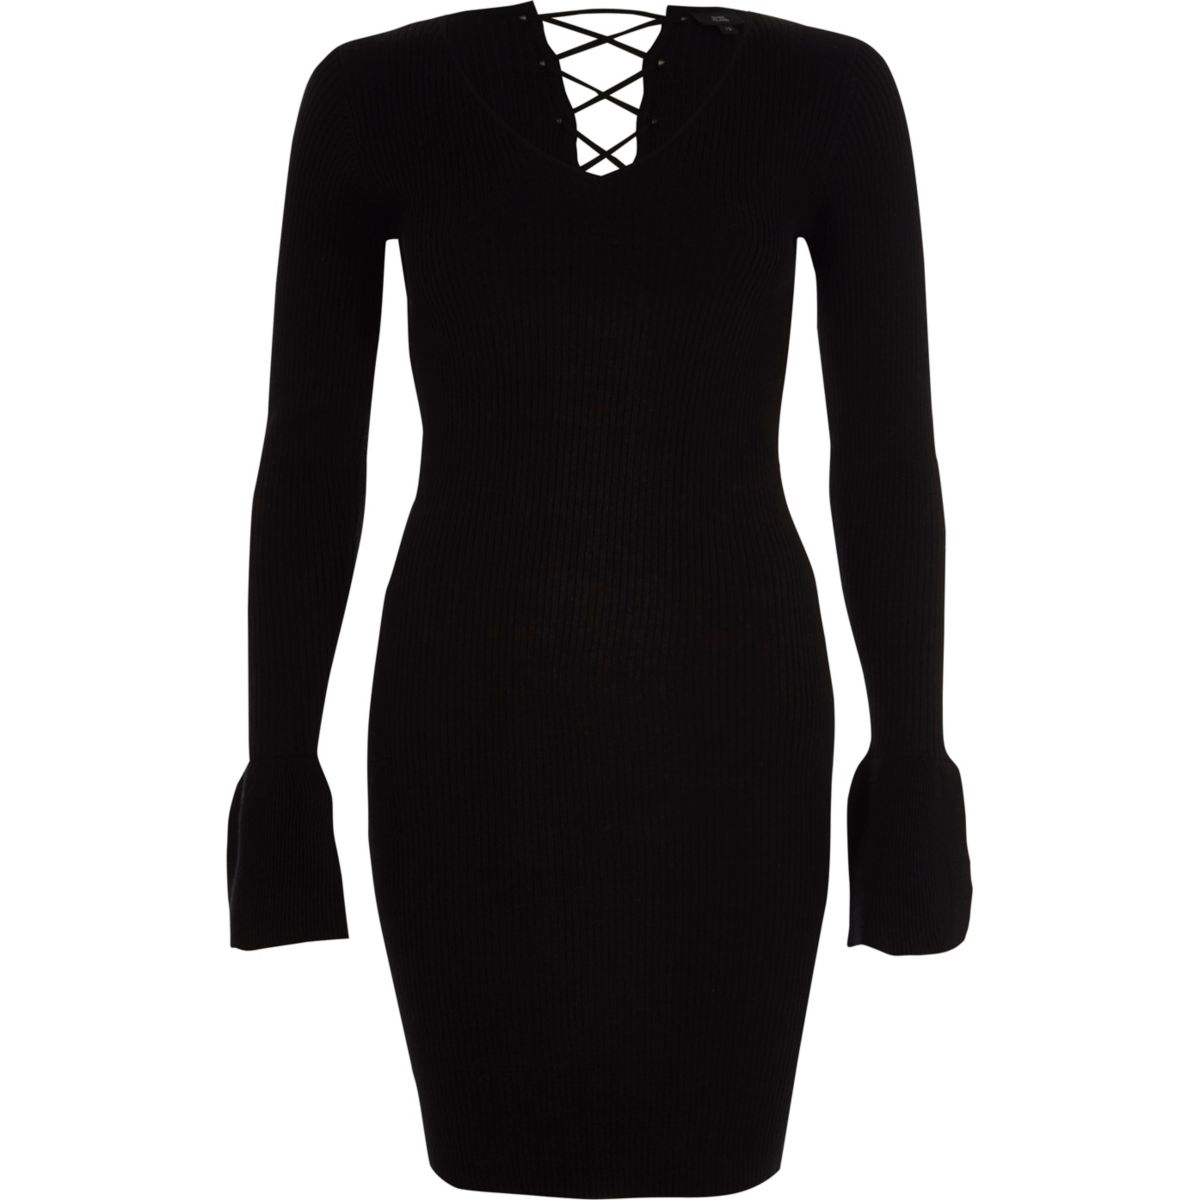 Black rib knit lace-up back bell sleeve dress